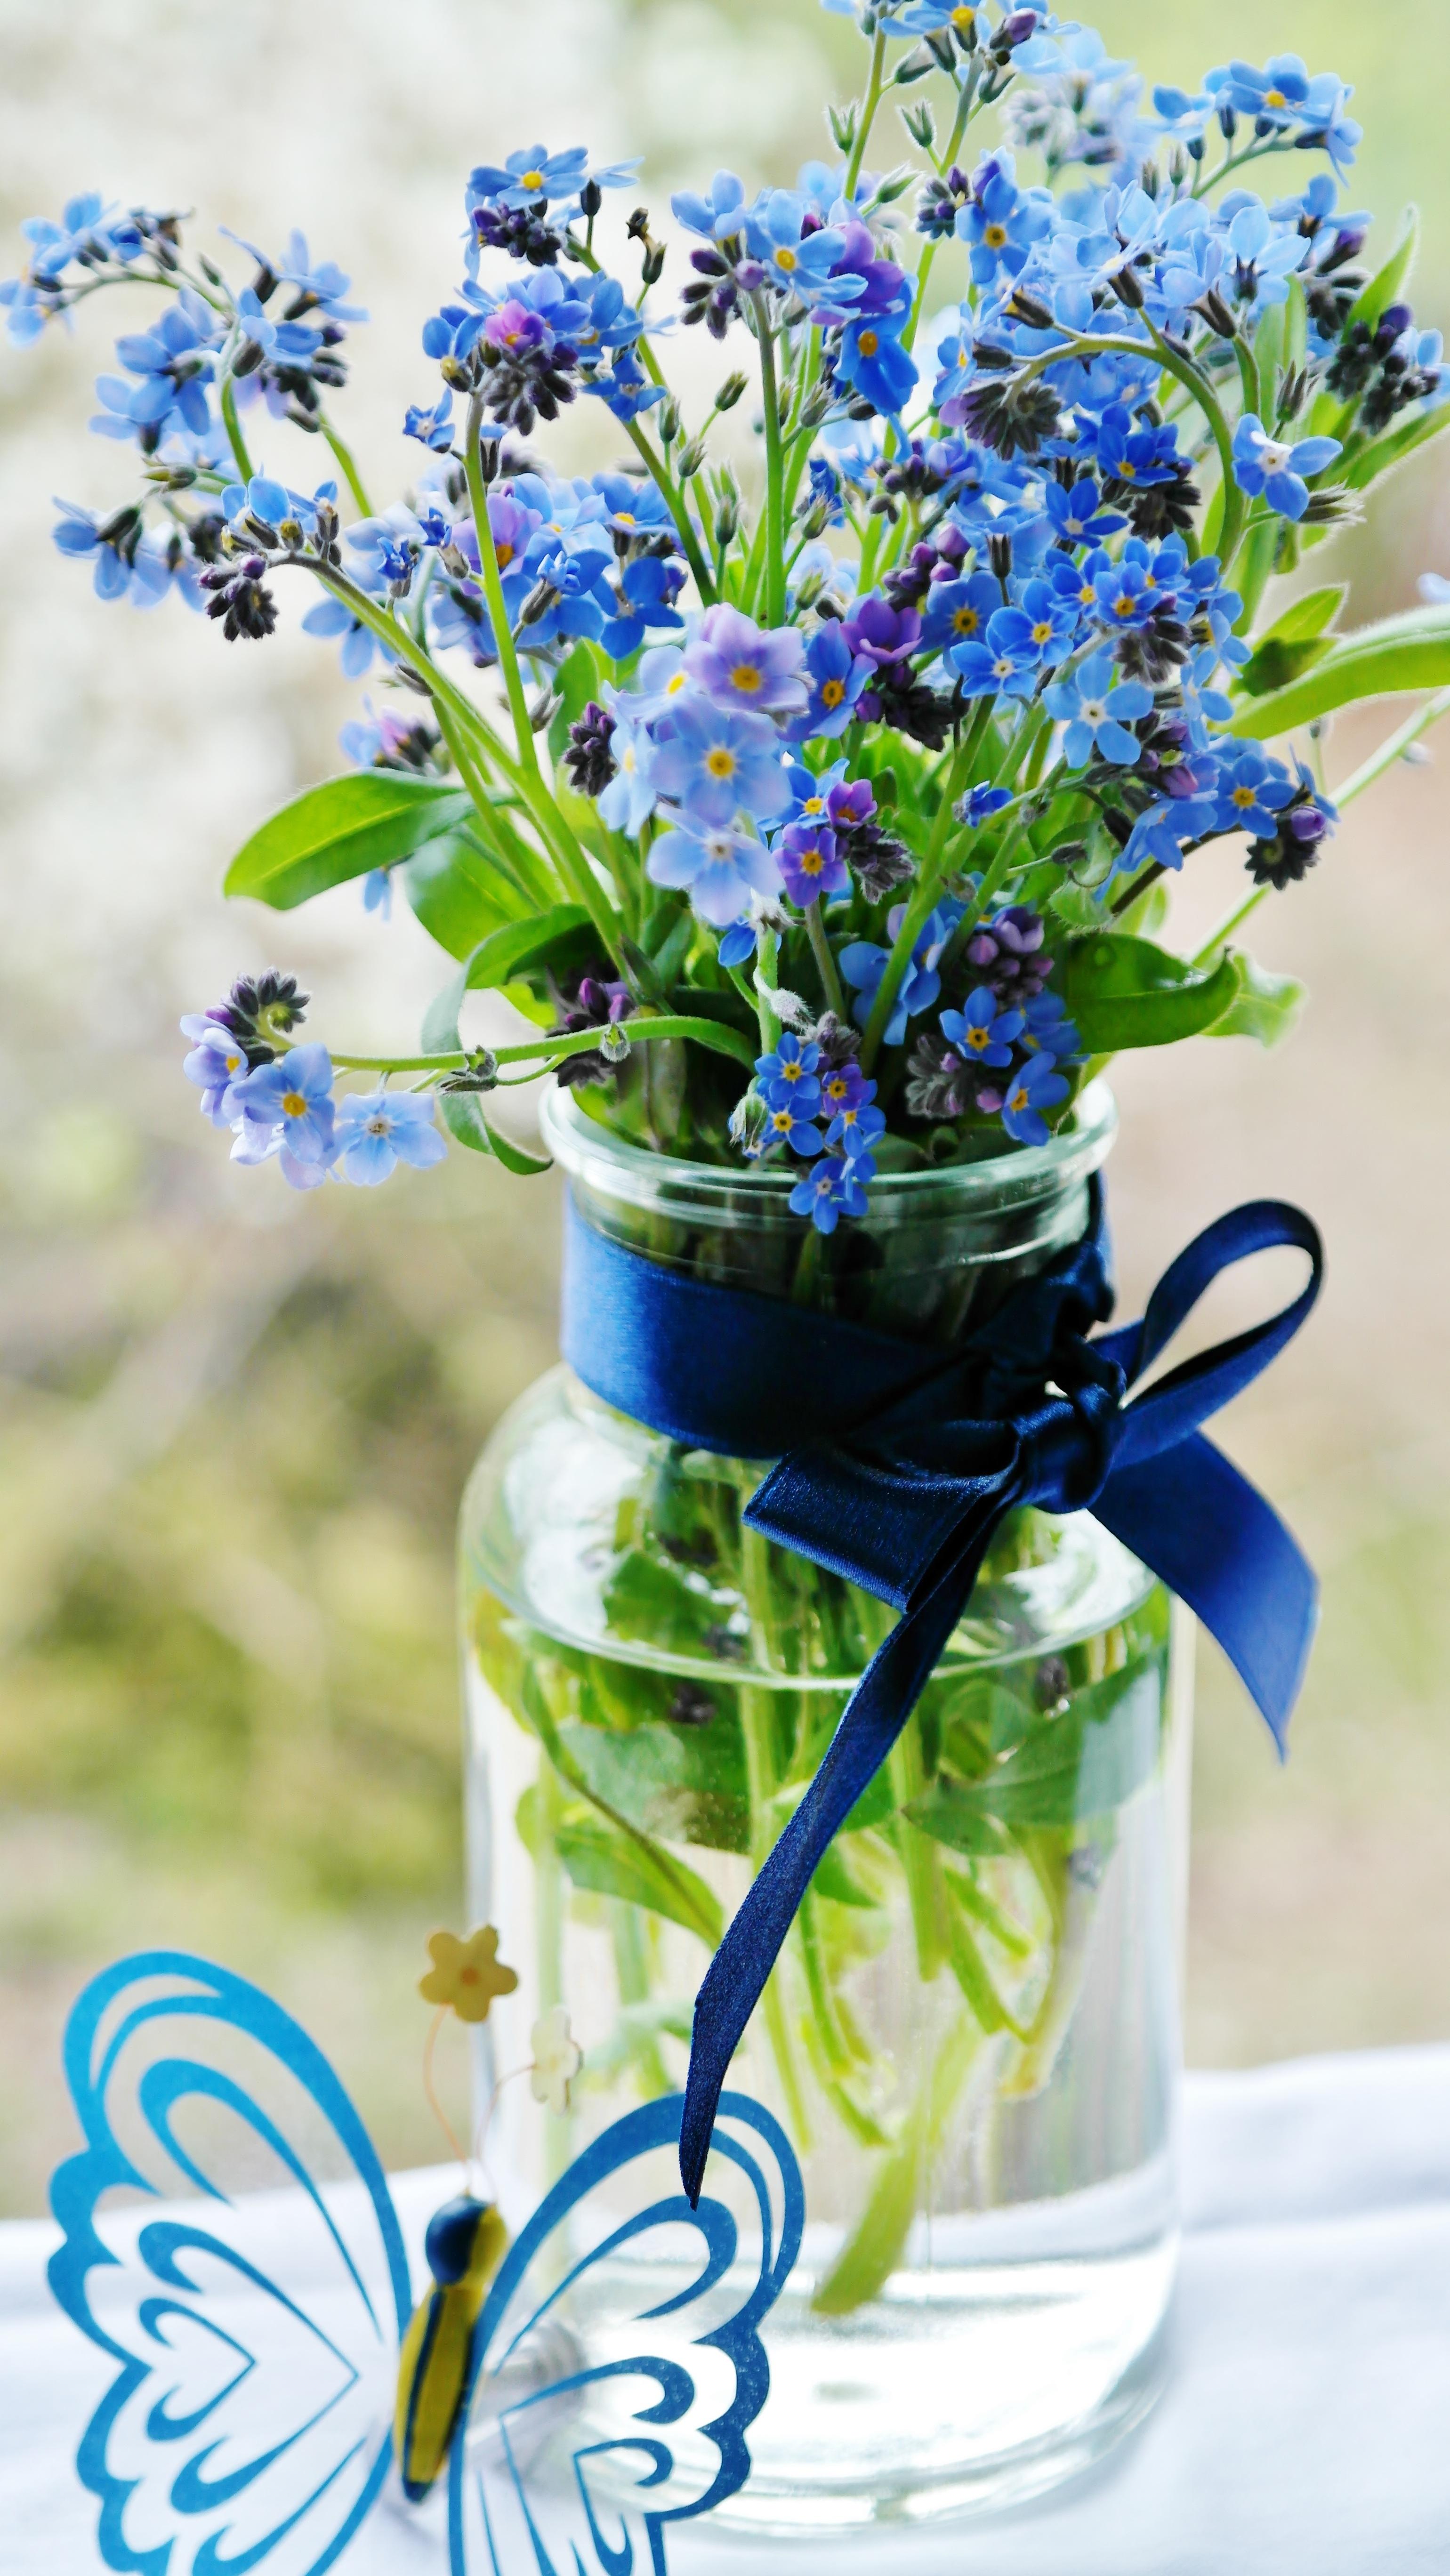 Fotos gratis naturaleza prado florecer primavera - Cortar hierba alta ...